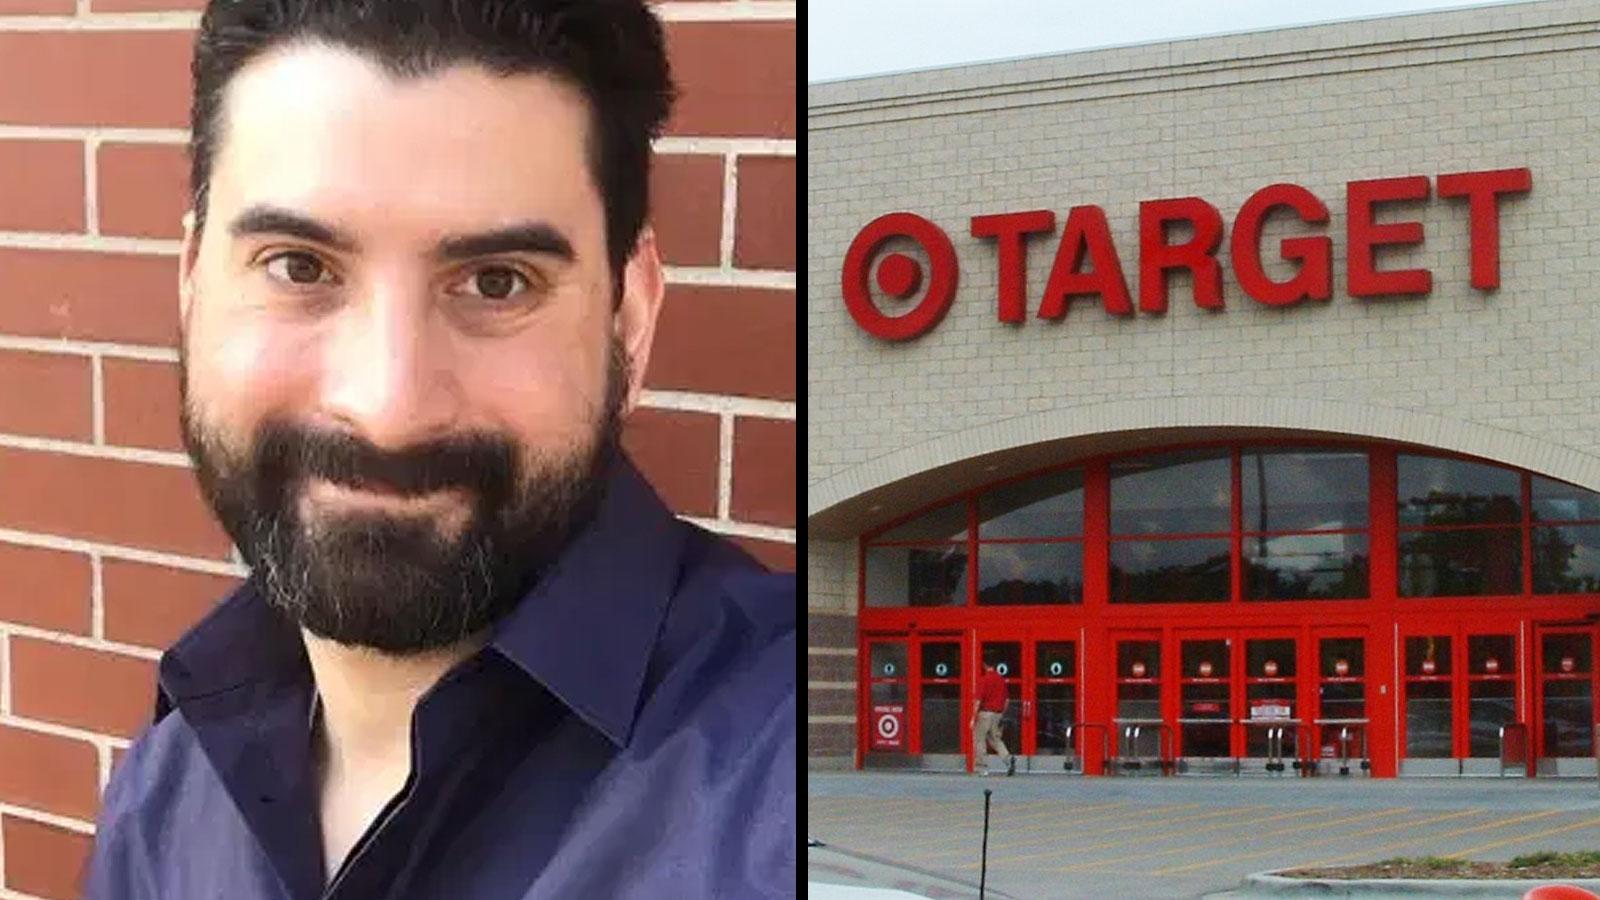 David Leavitt sparks outrage over Target employee toothbrush drama